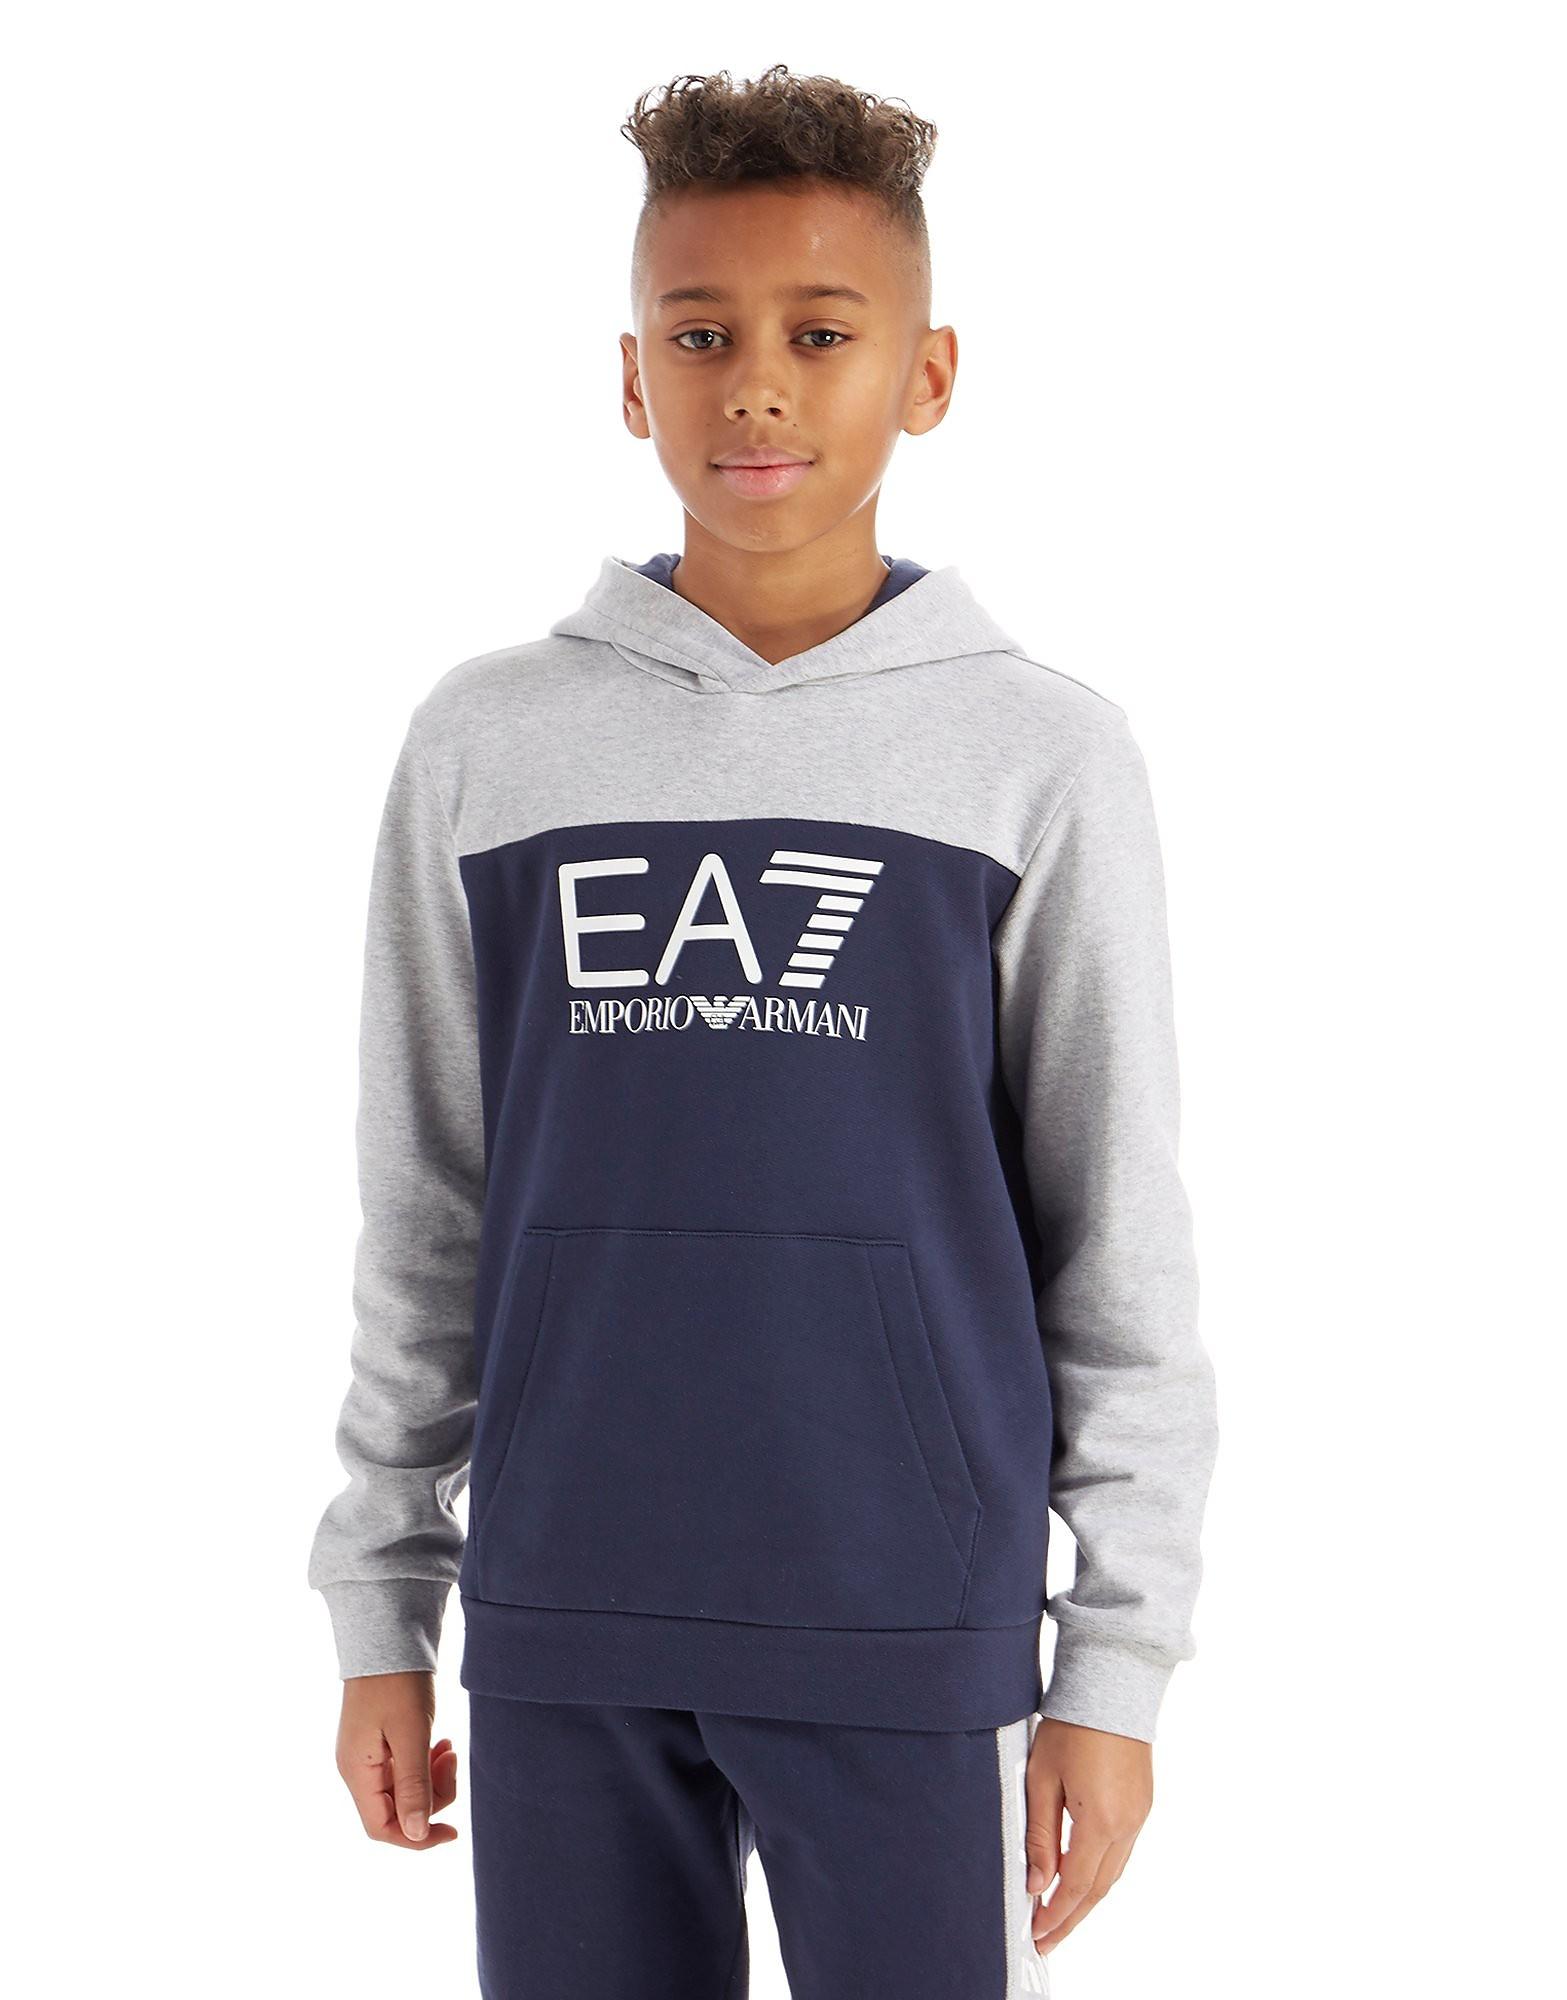 Emporio Armani EA7 Colourblock Fleece Overhead Hoodie Junior